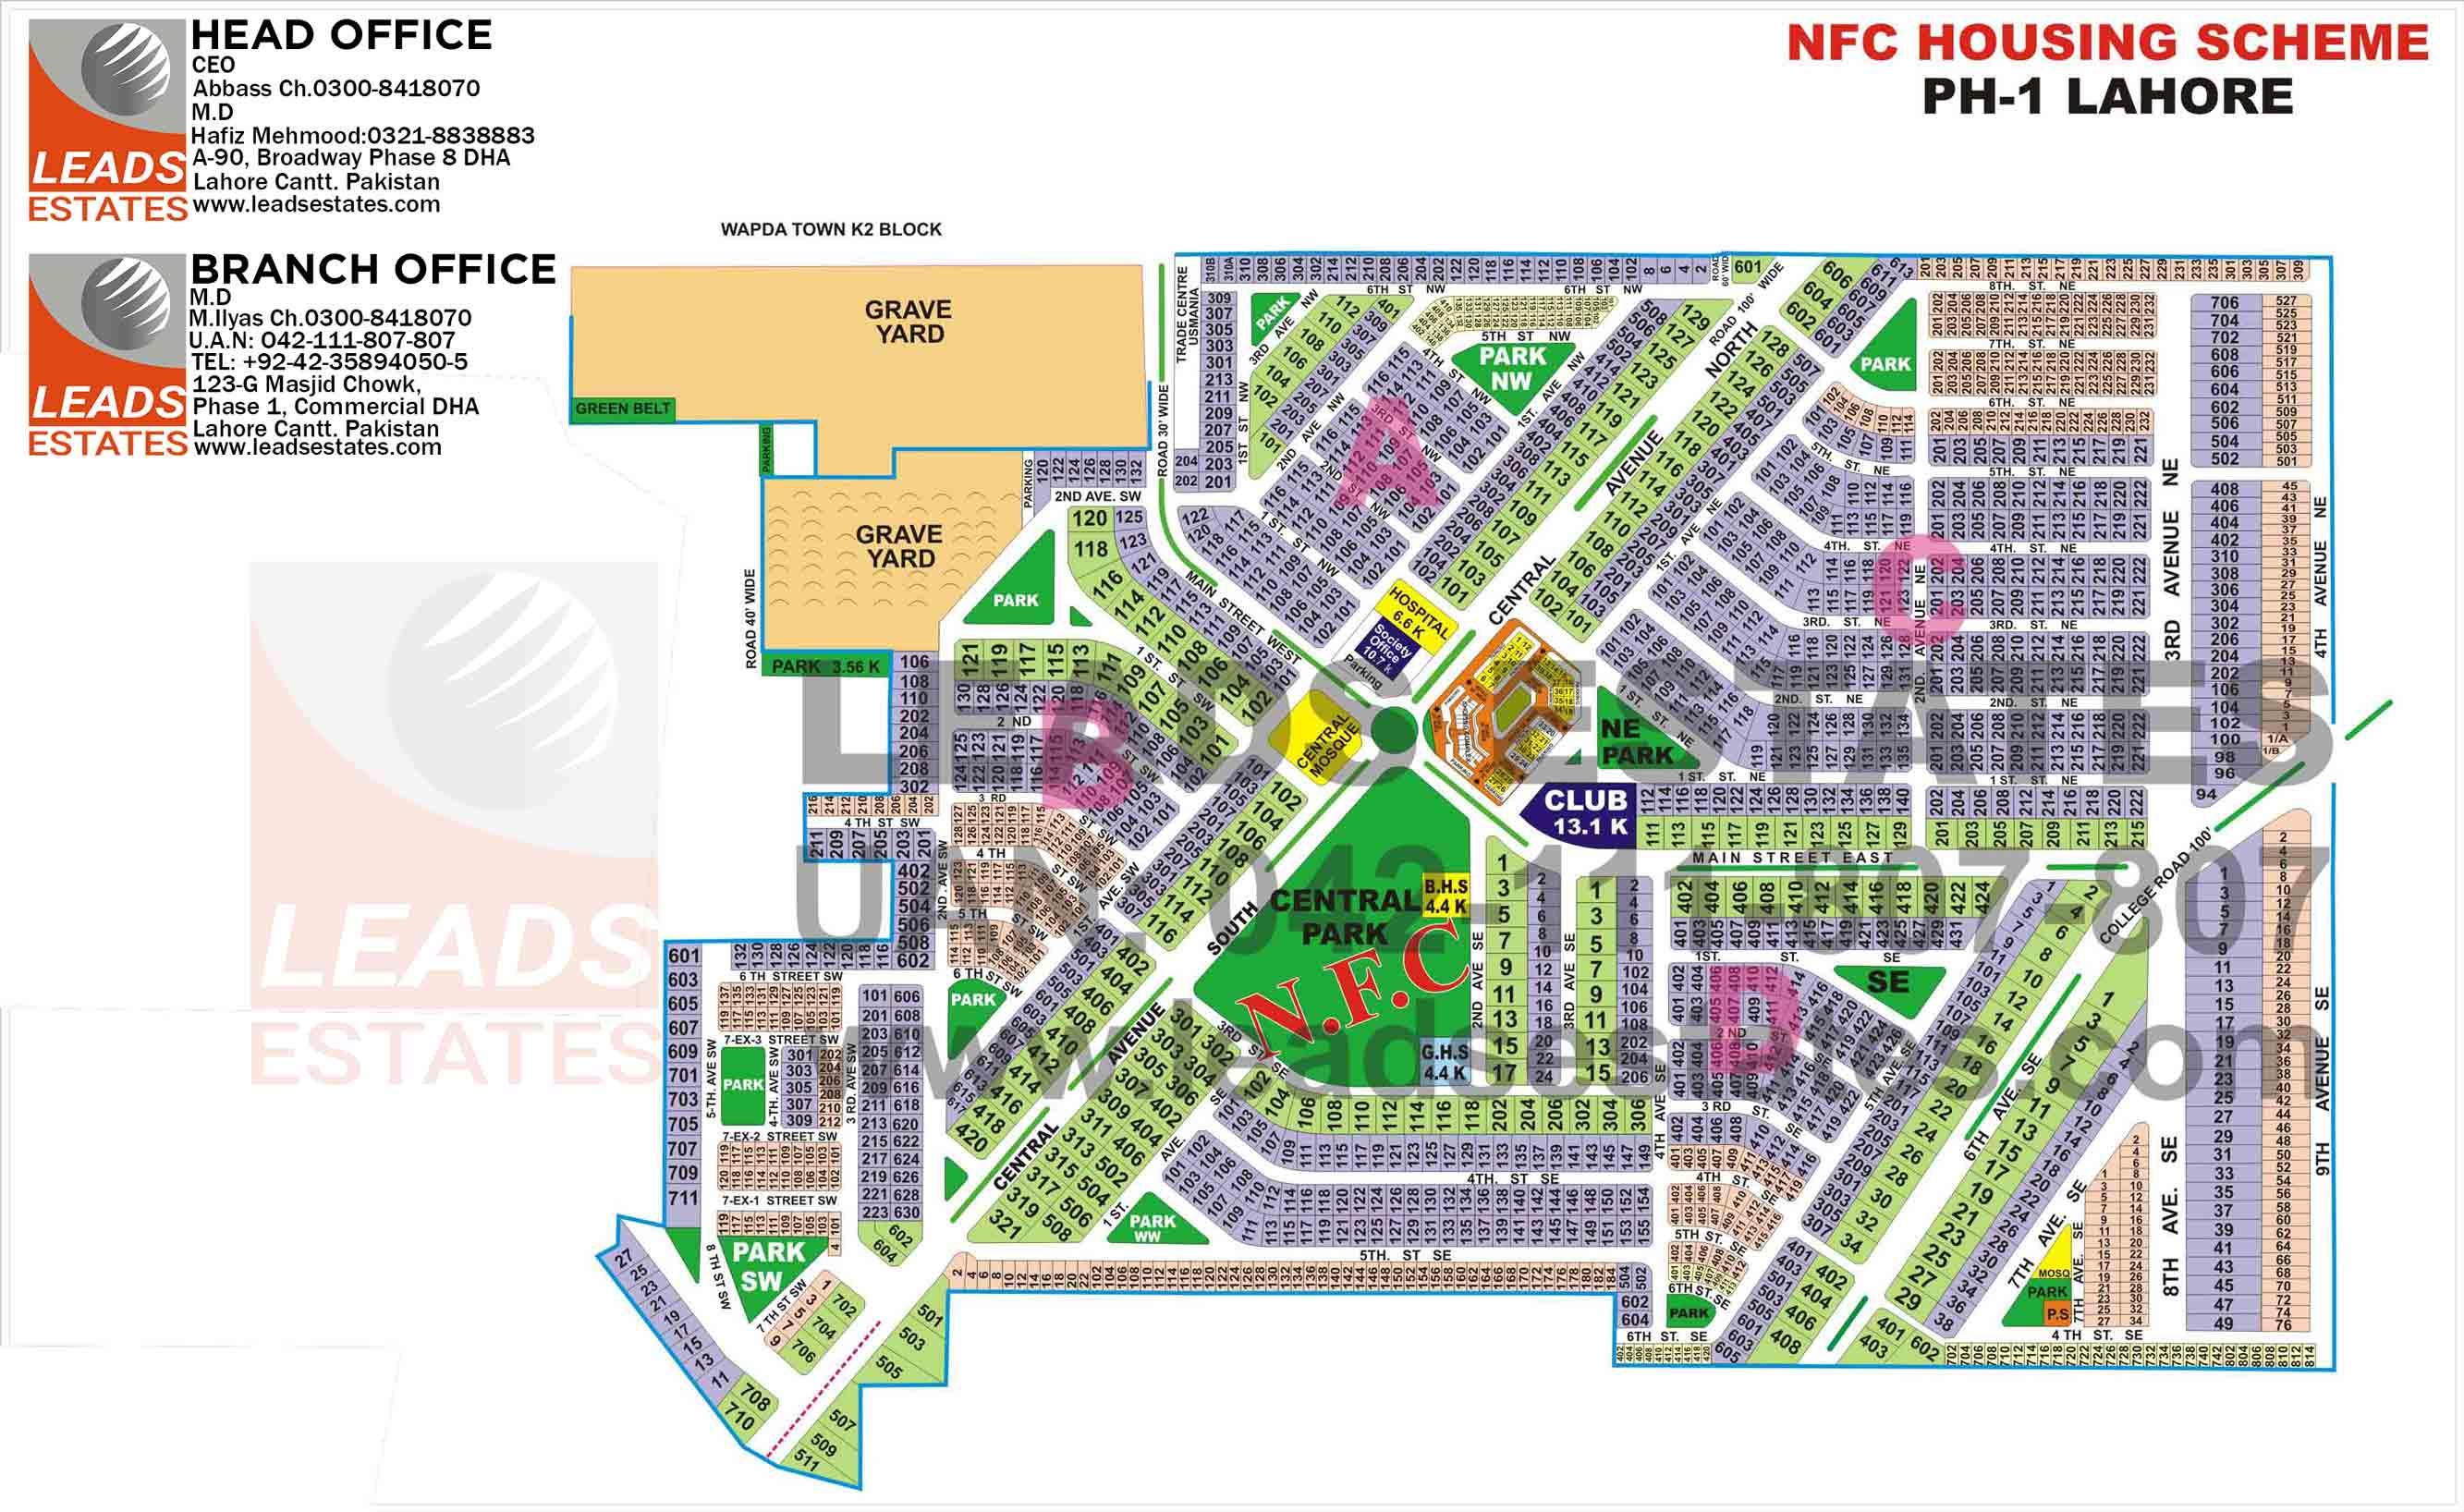 NFC Phase 1